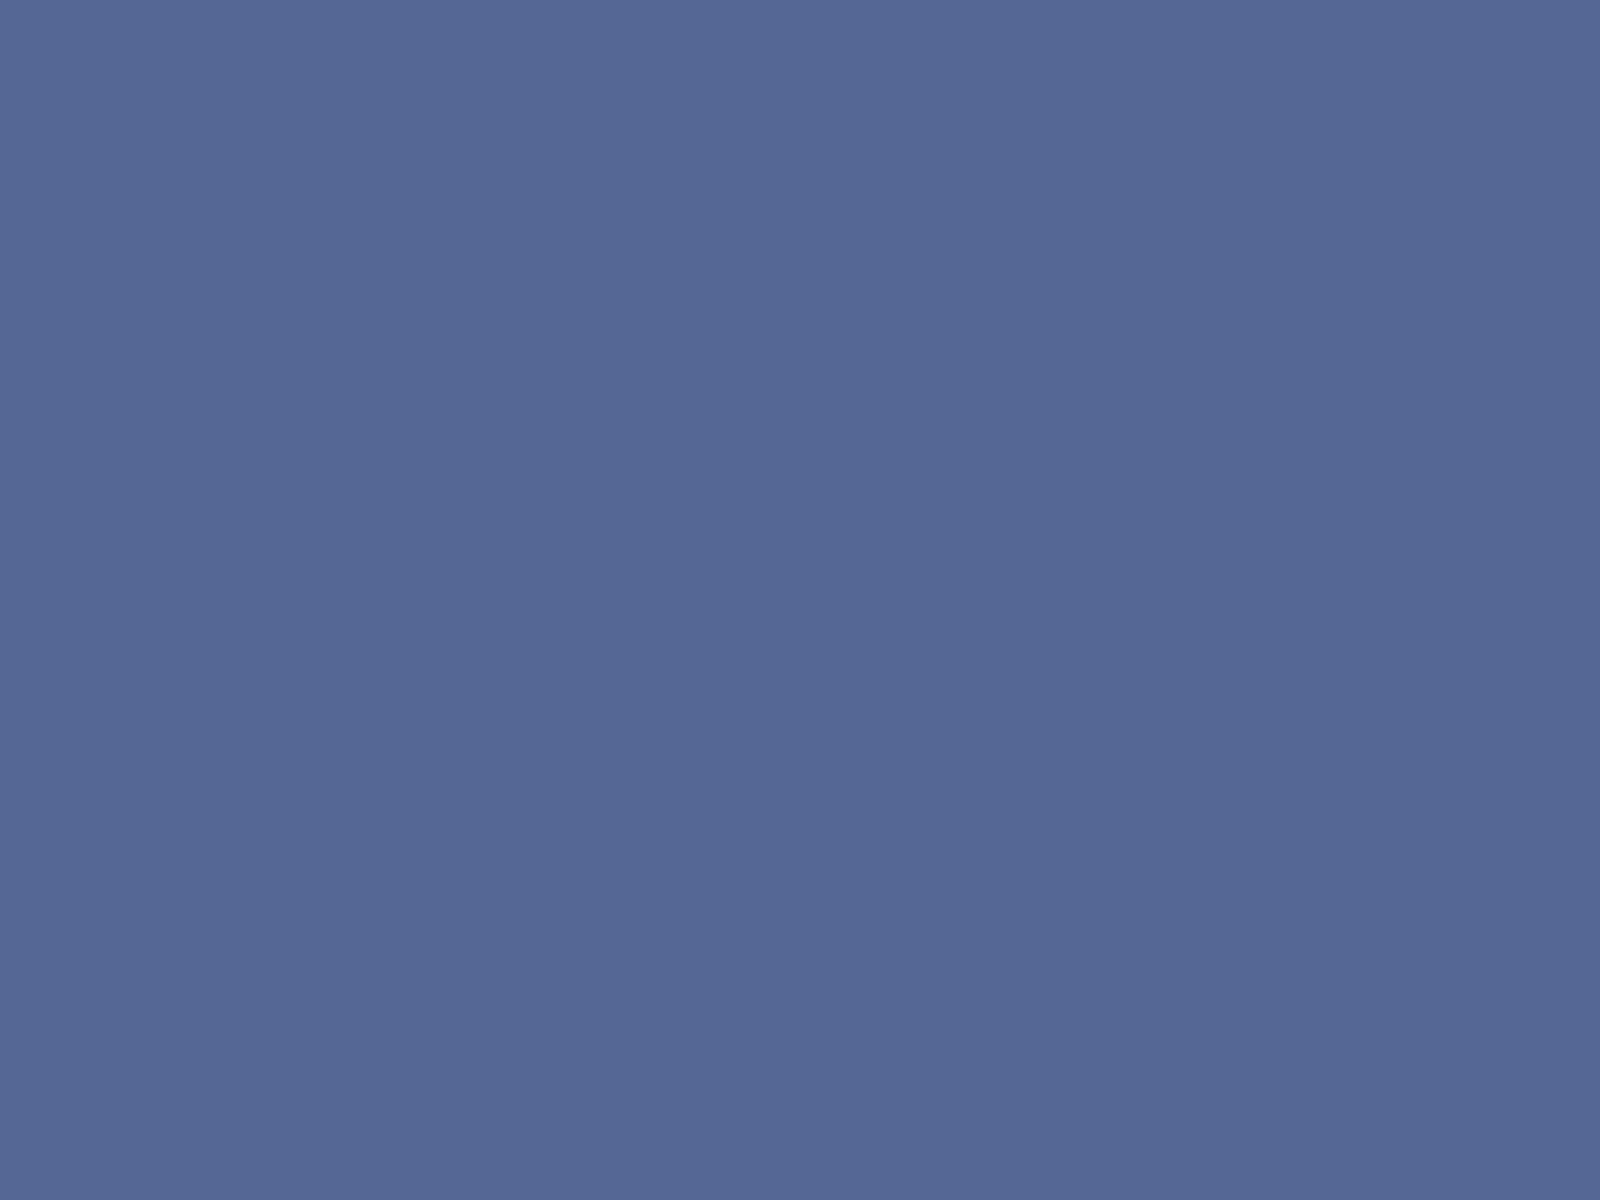 1600x1200 UCLA Blue Solid Color Background